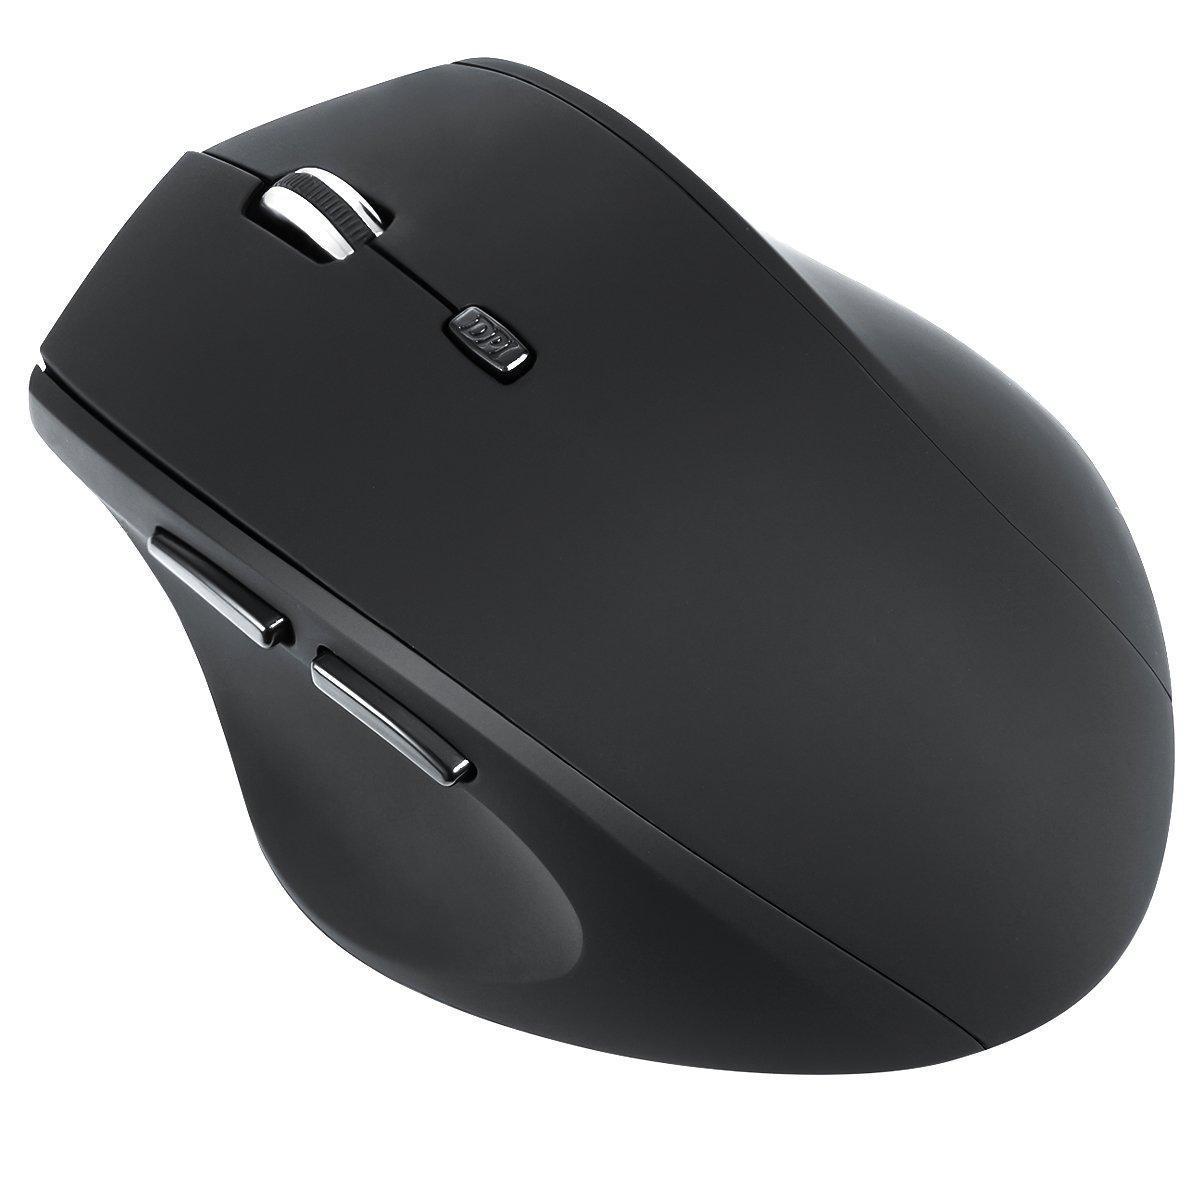 Mouse Gamer : Criacr USB Con cable Ergonomico Optico Ajustab